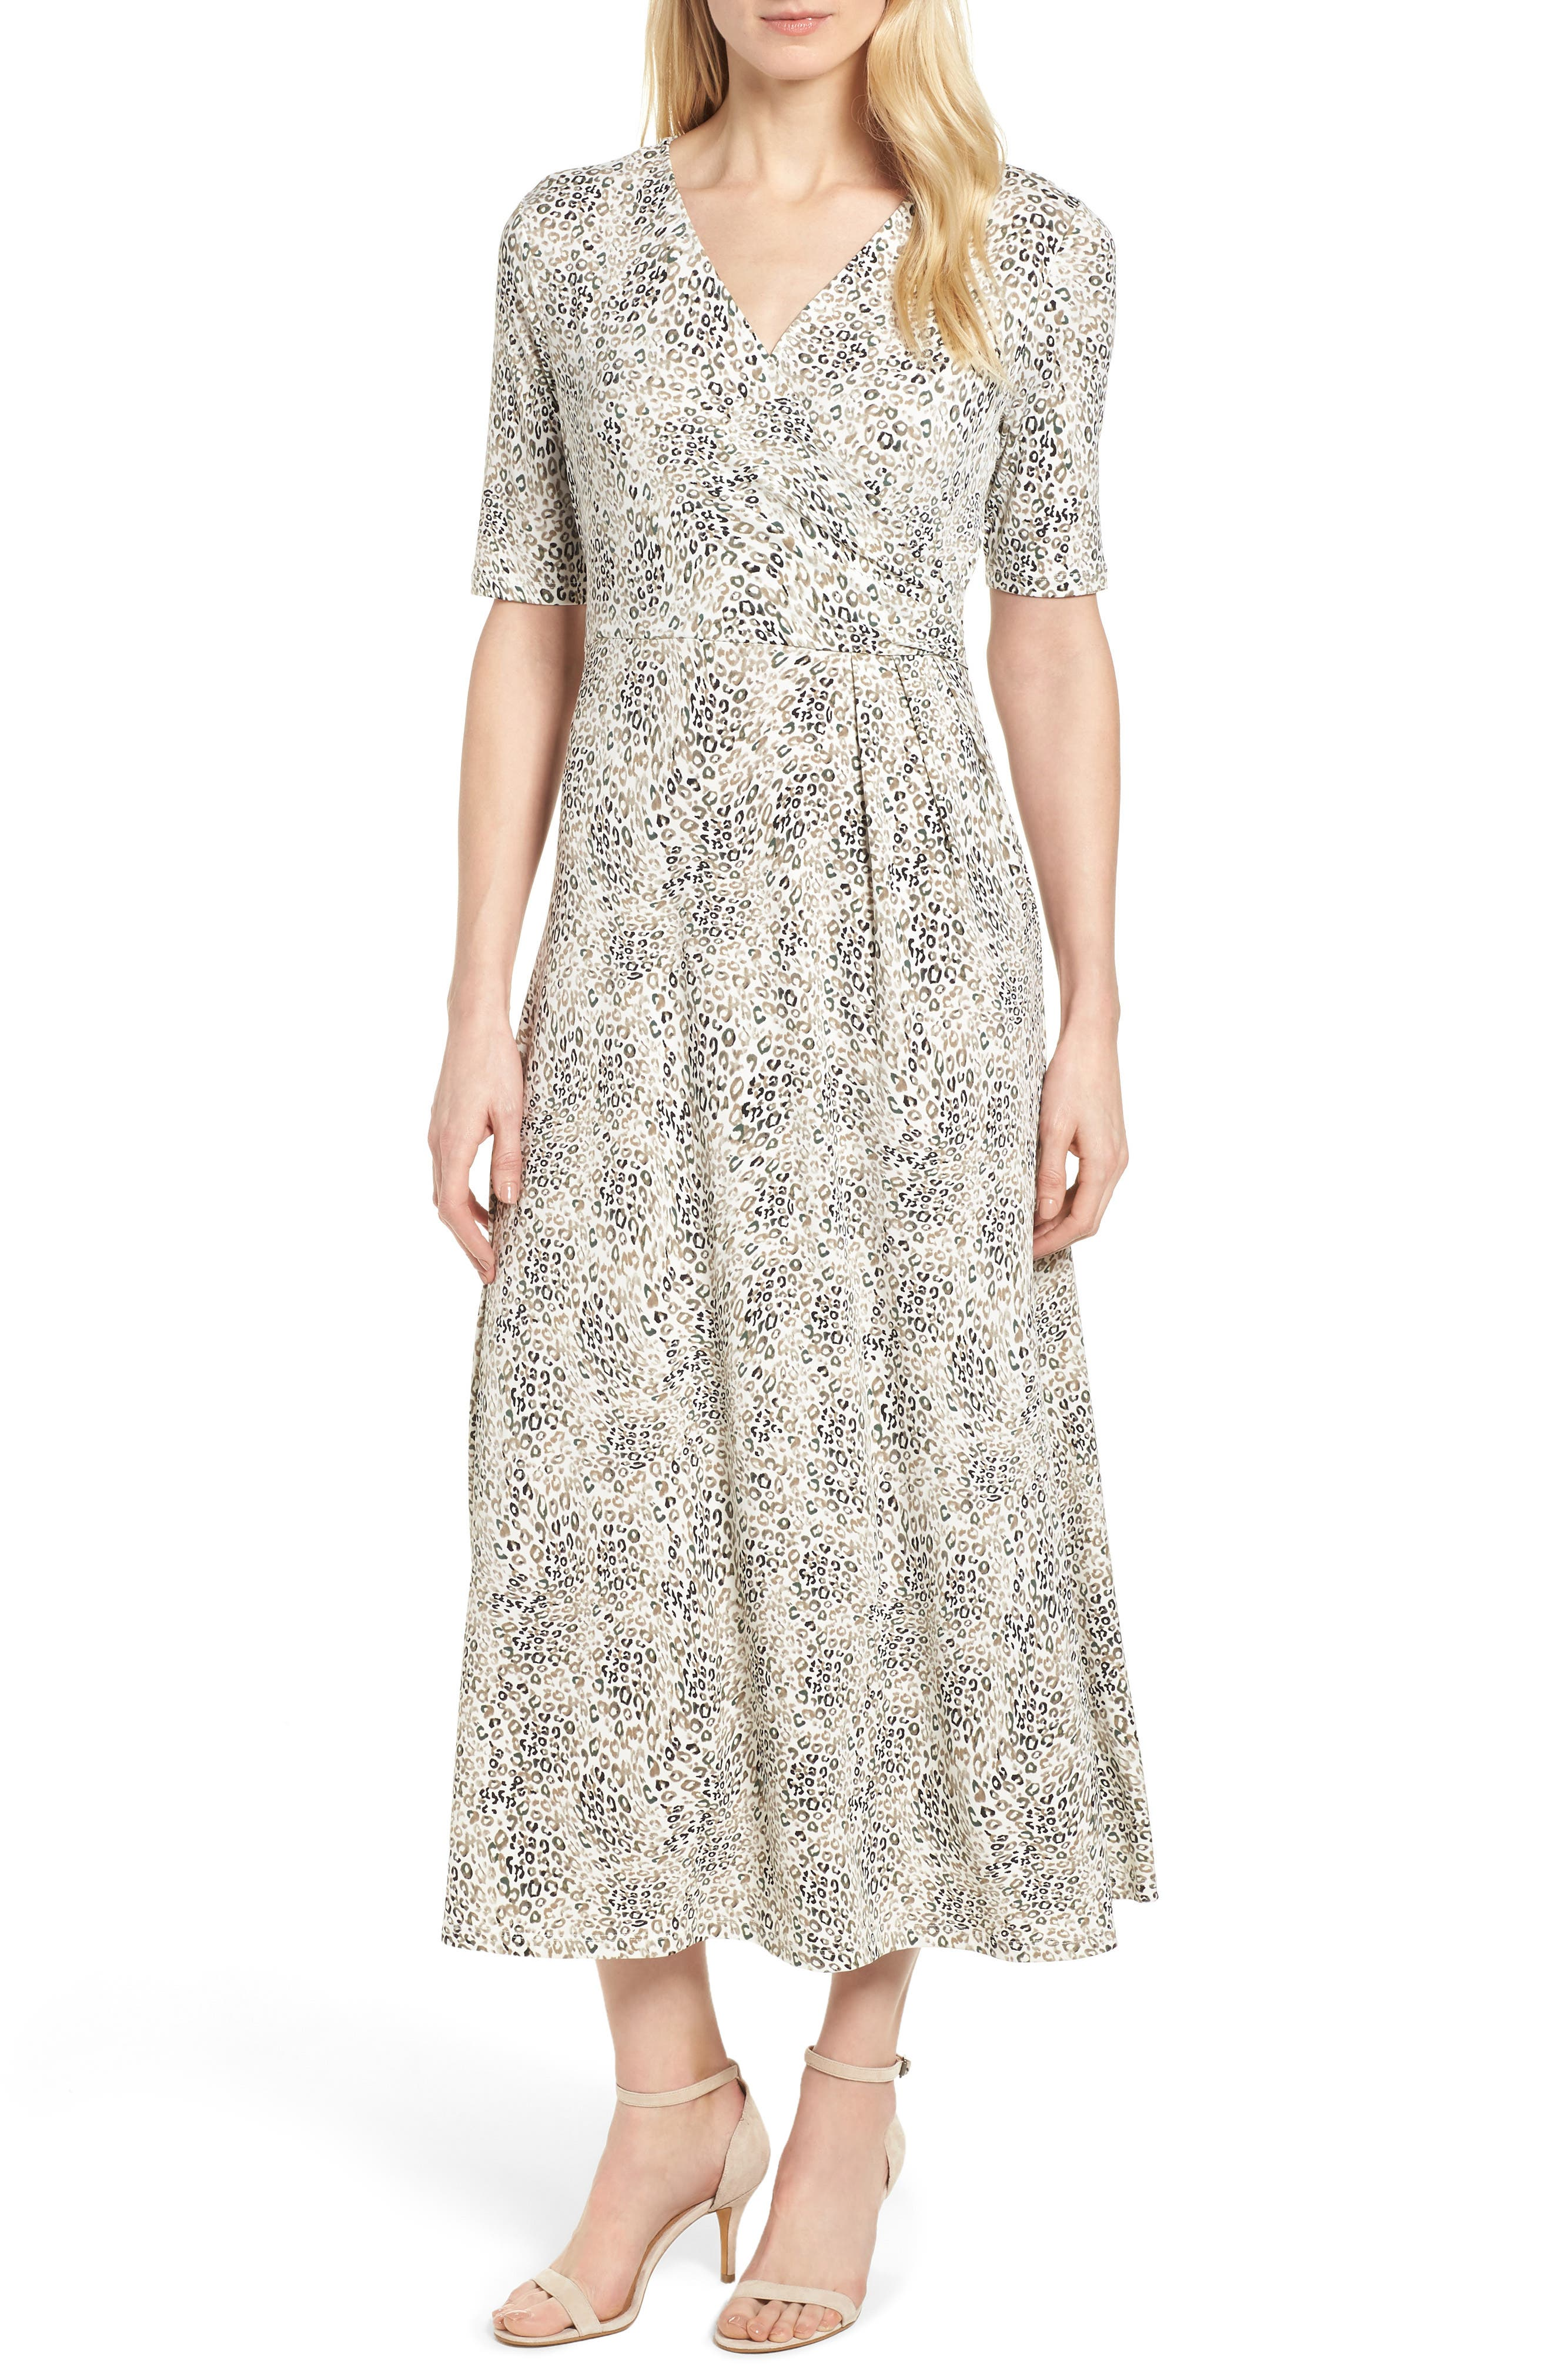 Leopard Print Maxi Dress,                         Main,                         color, 103-New Ivory